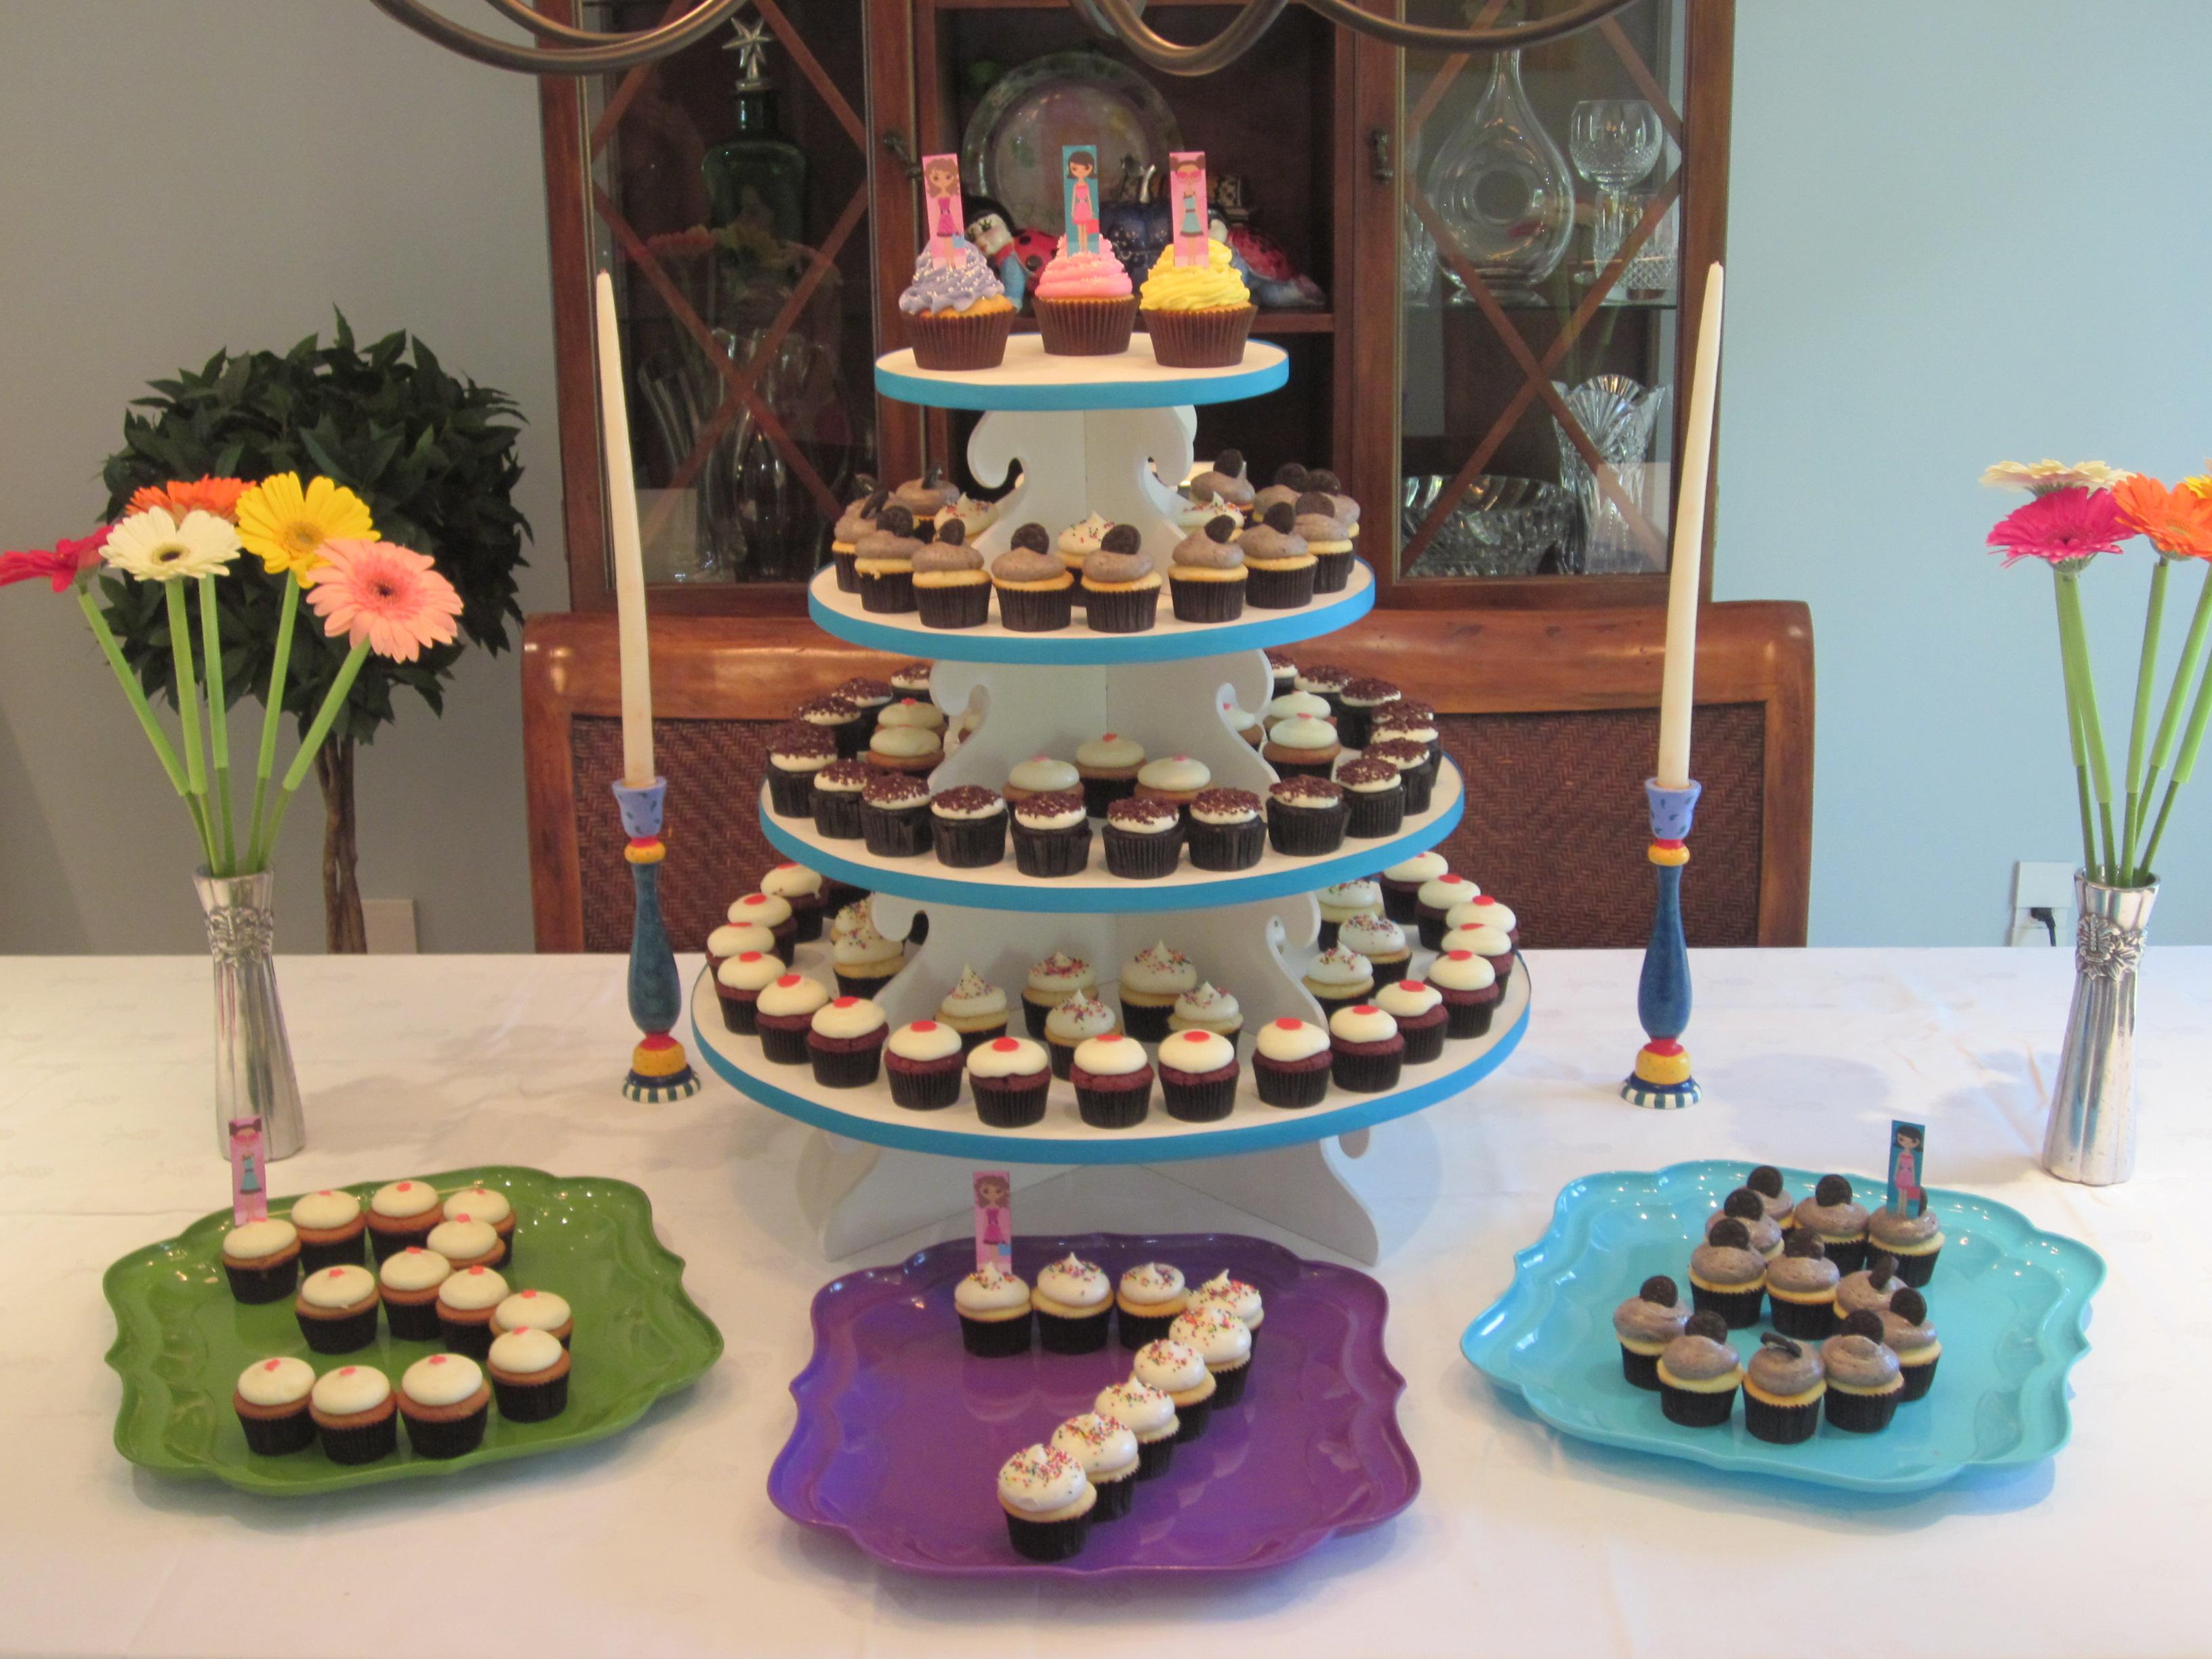 Birthday Cupcake Displays | Sugar Mama in Birthday Display Cupcakes